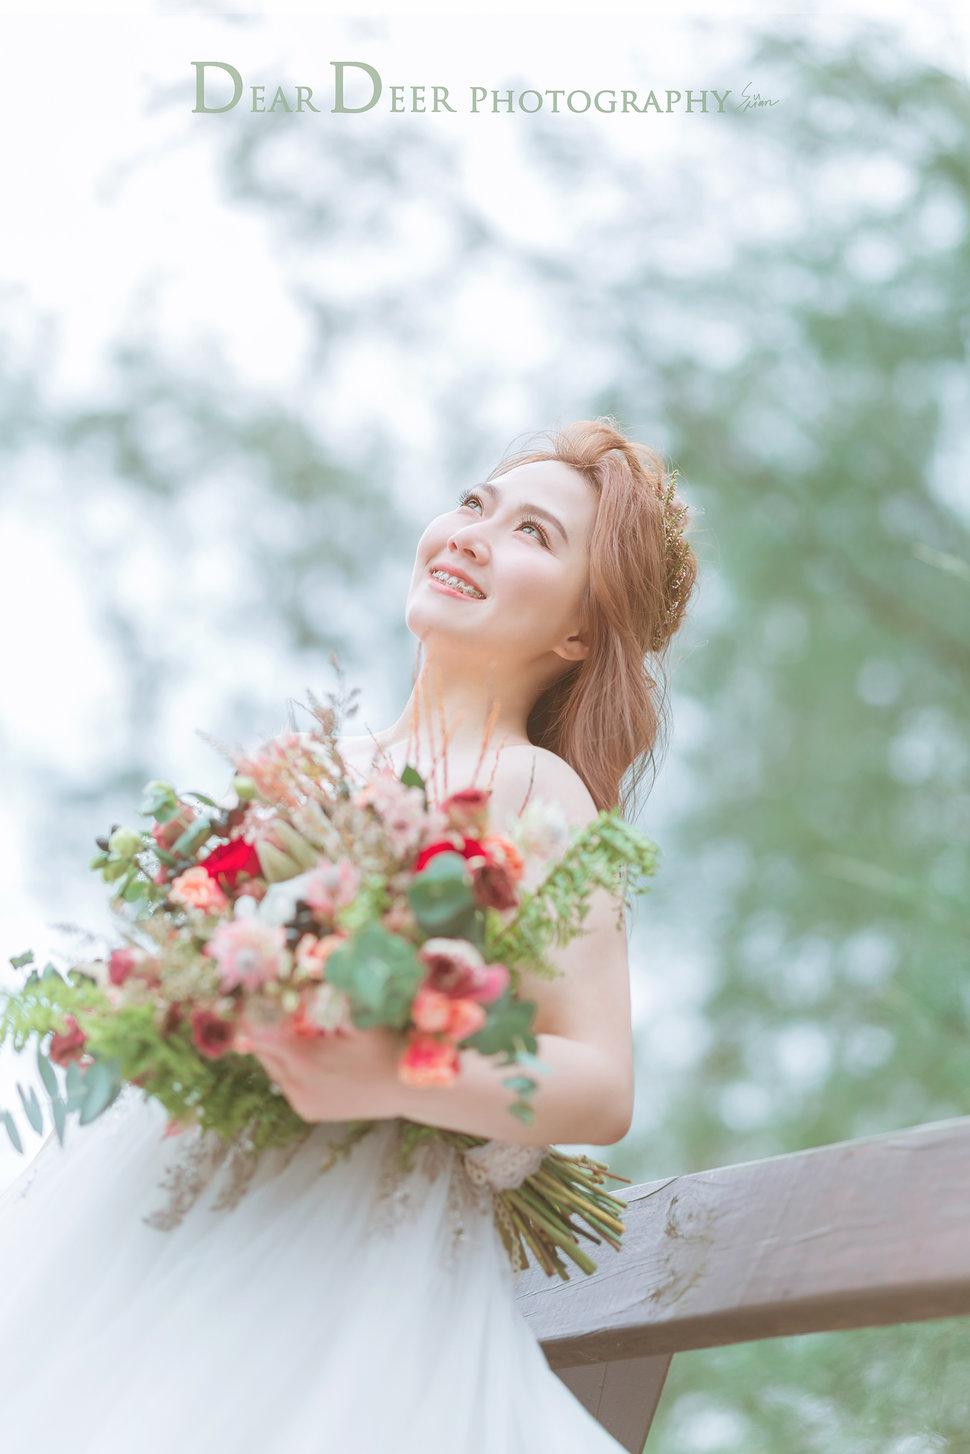 Dear Deer|花草仙女風格(編號:2155006) - Dear Deer鹿兒攝影|女攝影師蘇蔓 - 結婚吧